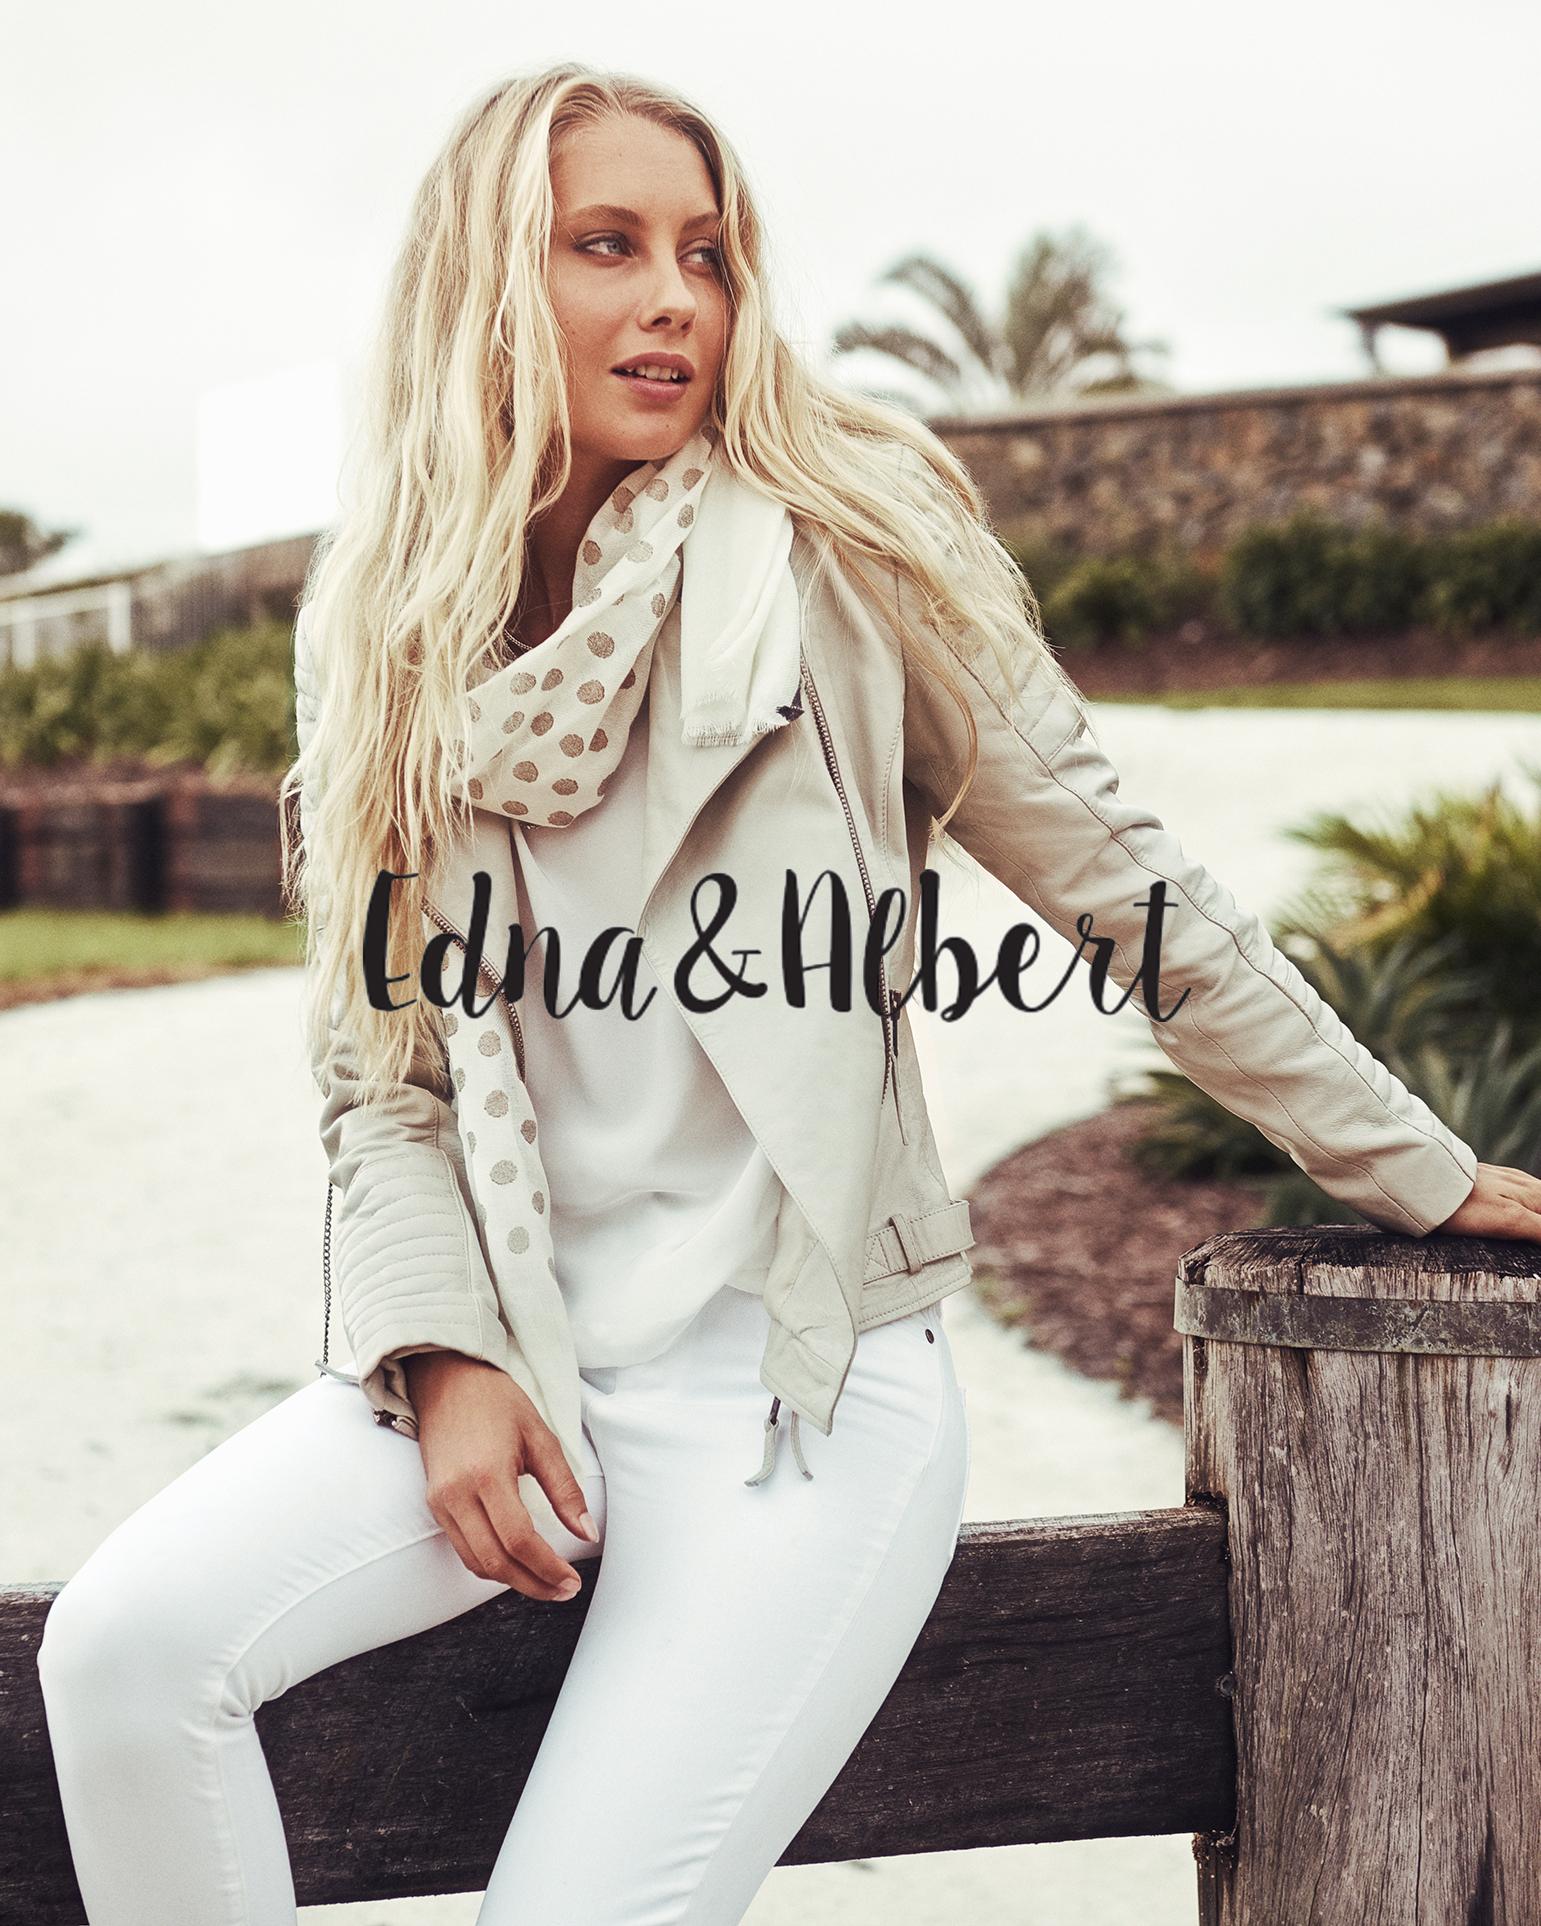 EDNA & ALBERT     Model - Amanda Guyling / Stylist - Marisa Sidoti /  HMUA - Nicholas Morley    Location - The Grove, Byron Bay. NSW